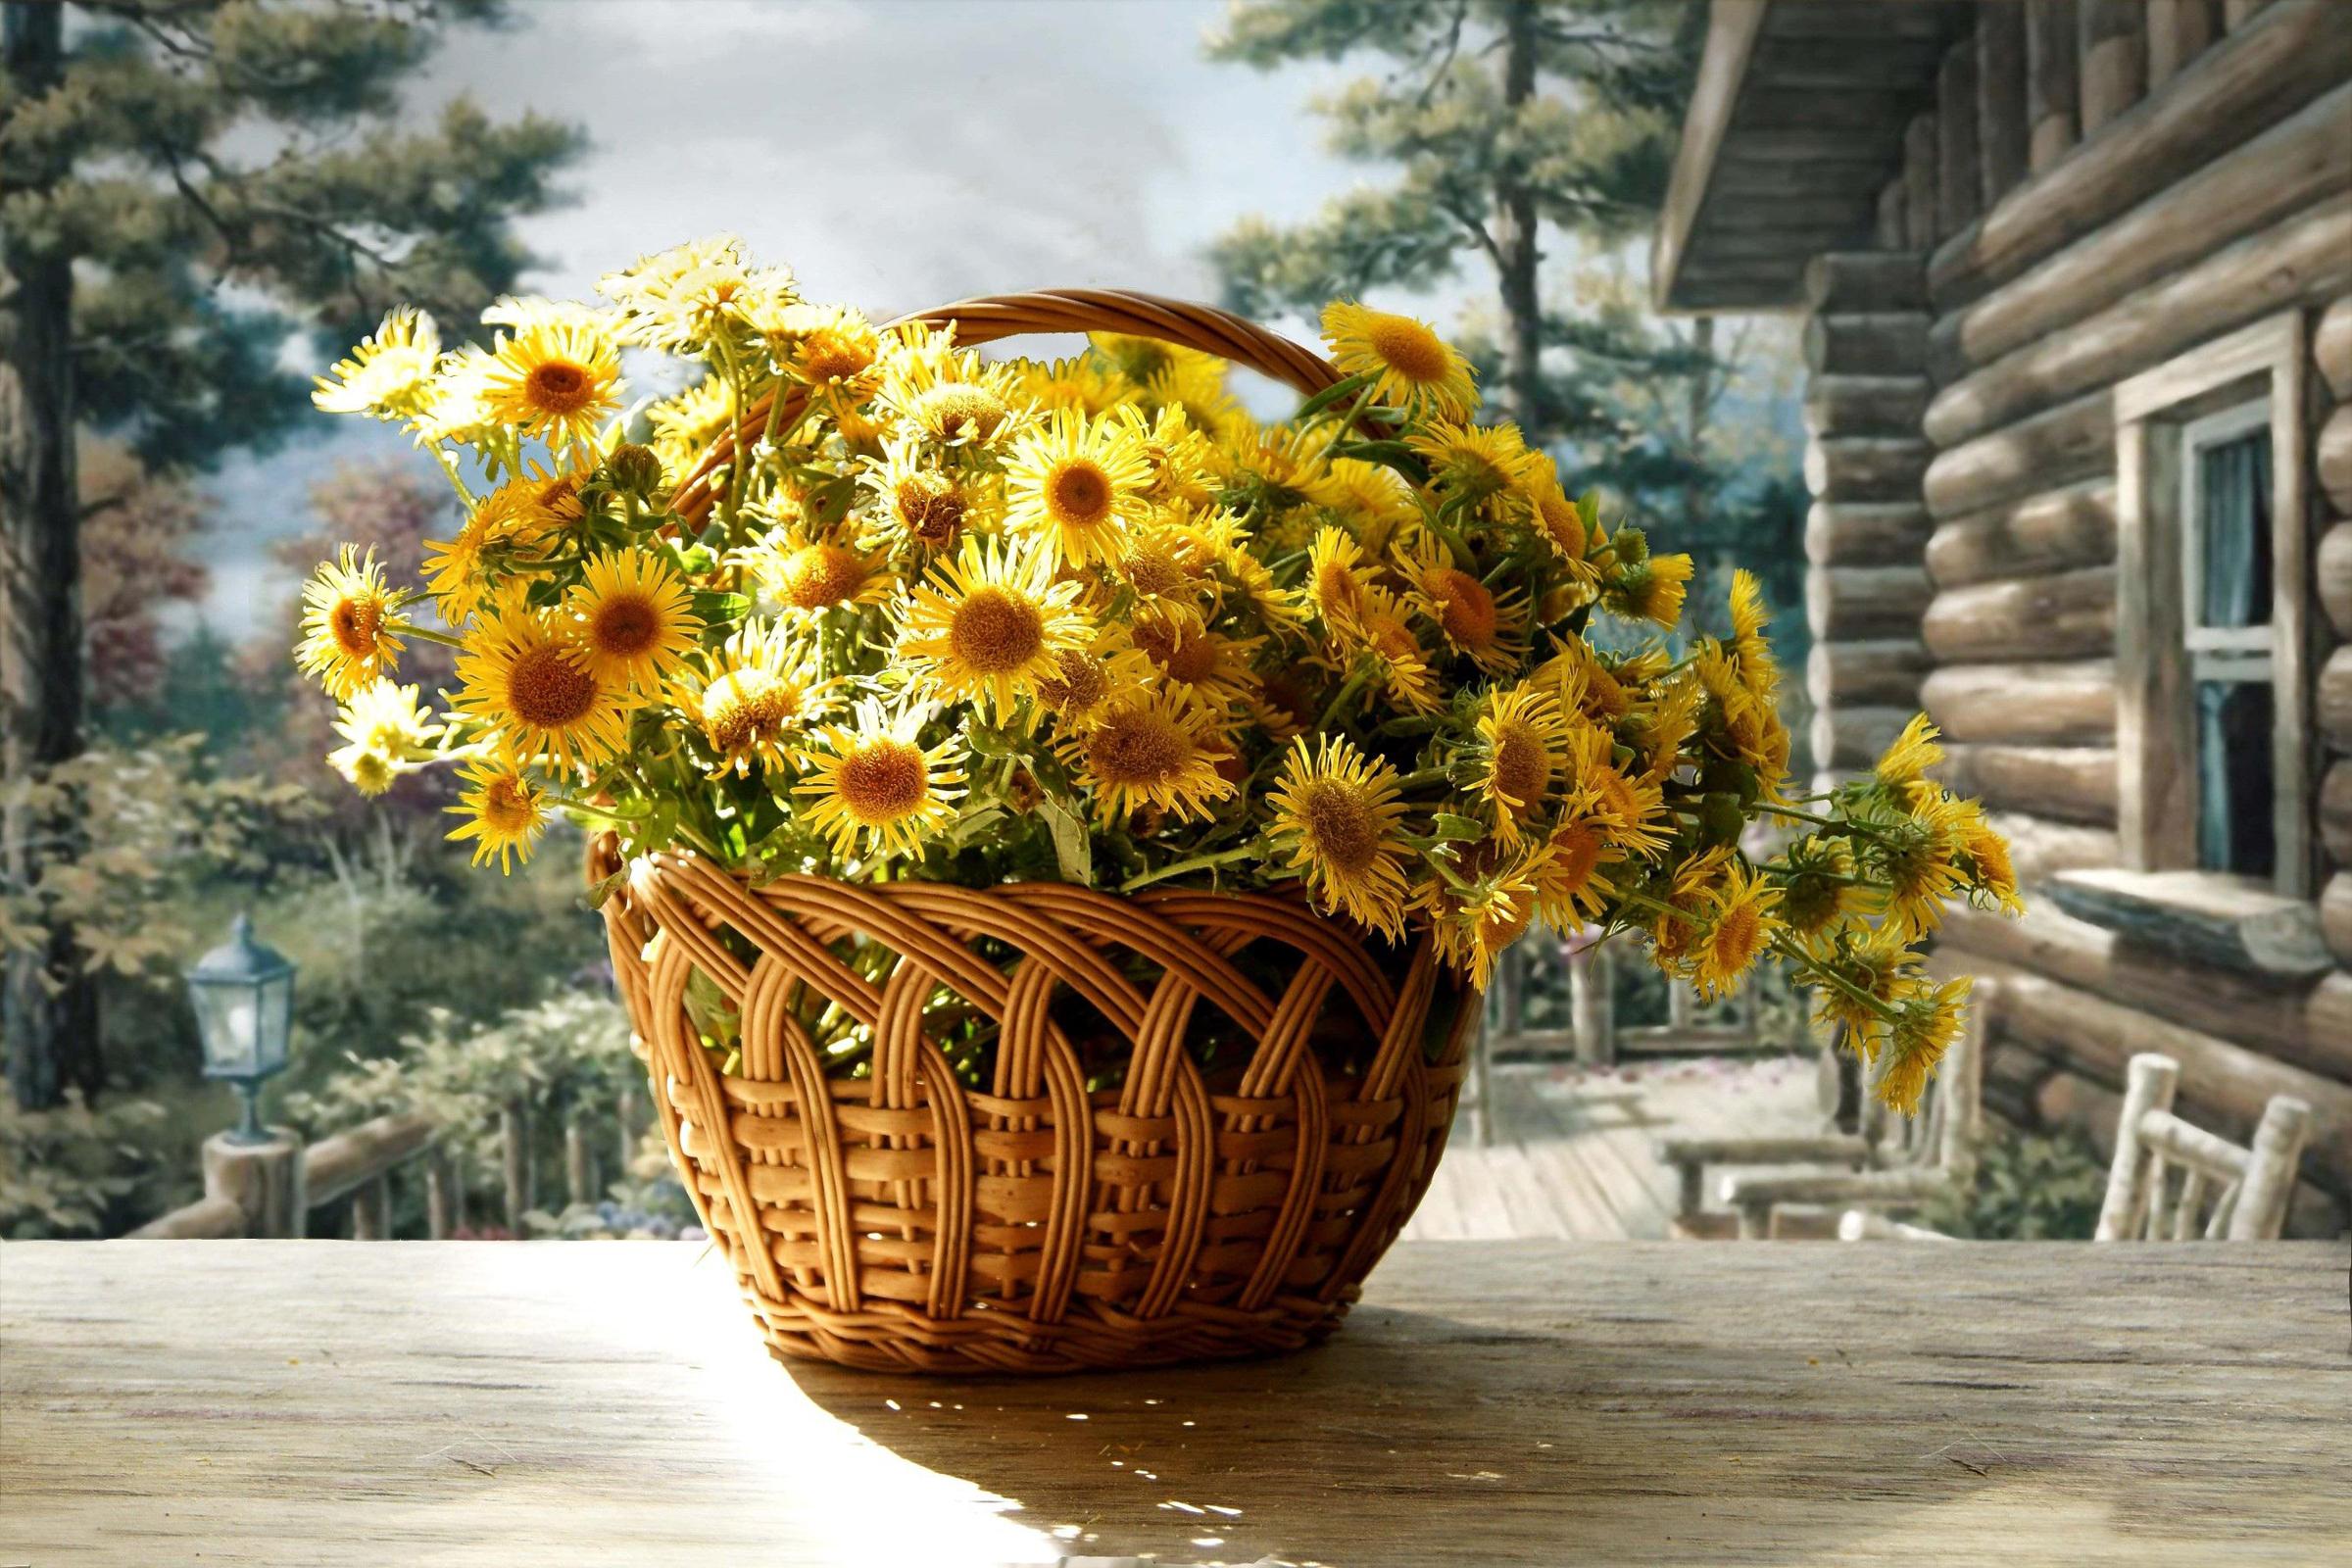 http://www.zastavki.com/pictures/originals/2014/Nature___Flowers_Beautiful_flowers_in_a_basket_Chrysanthemum_067234_.jpg